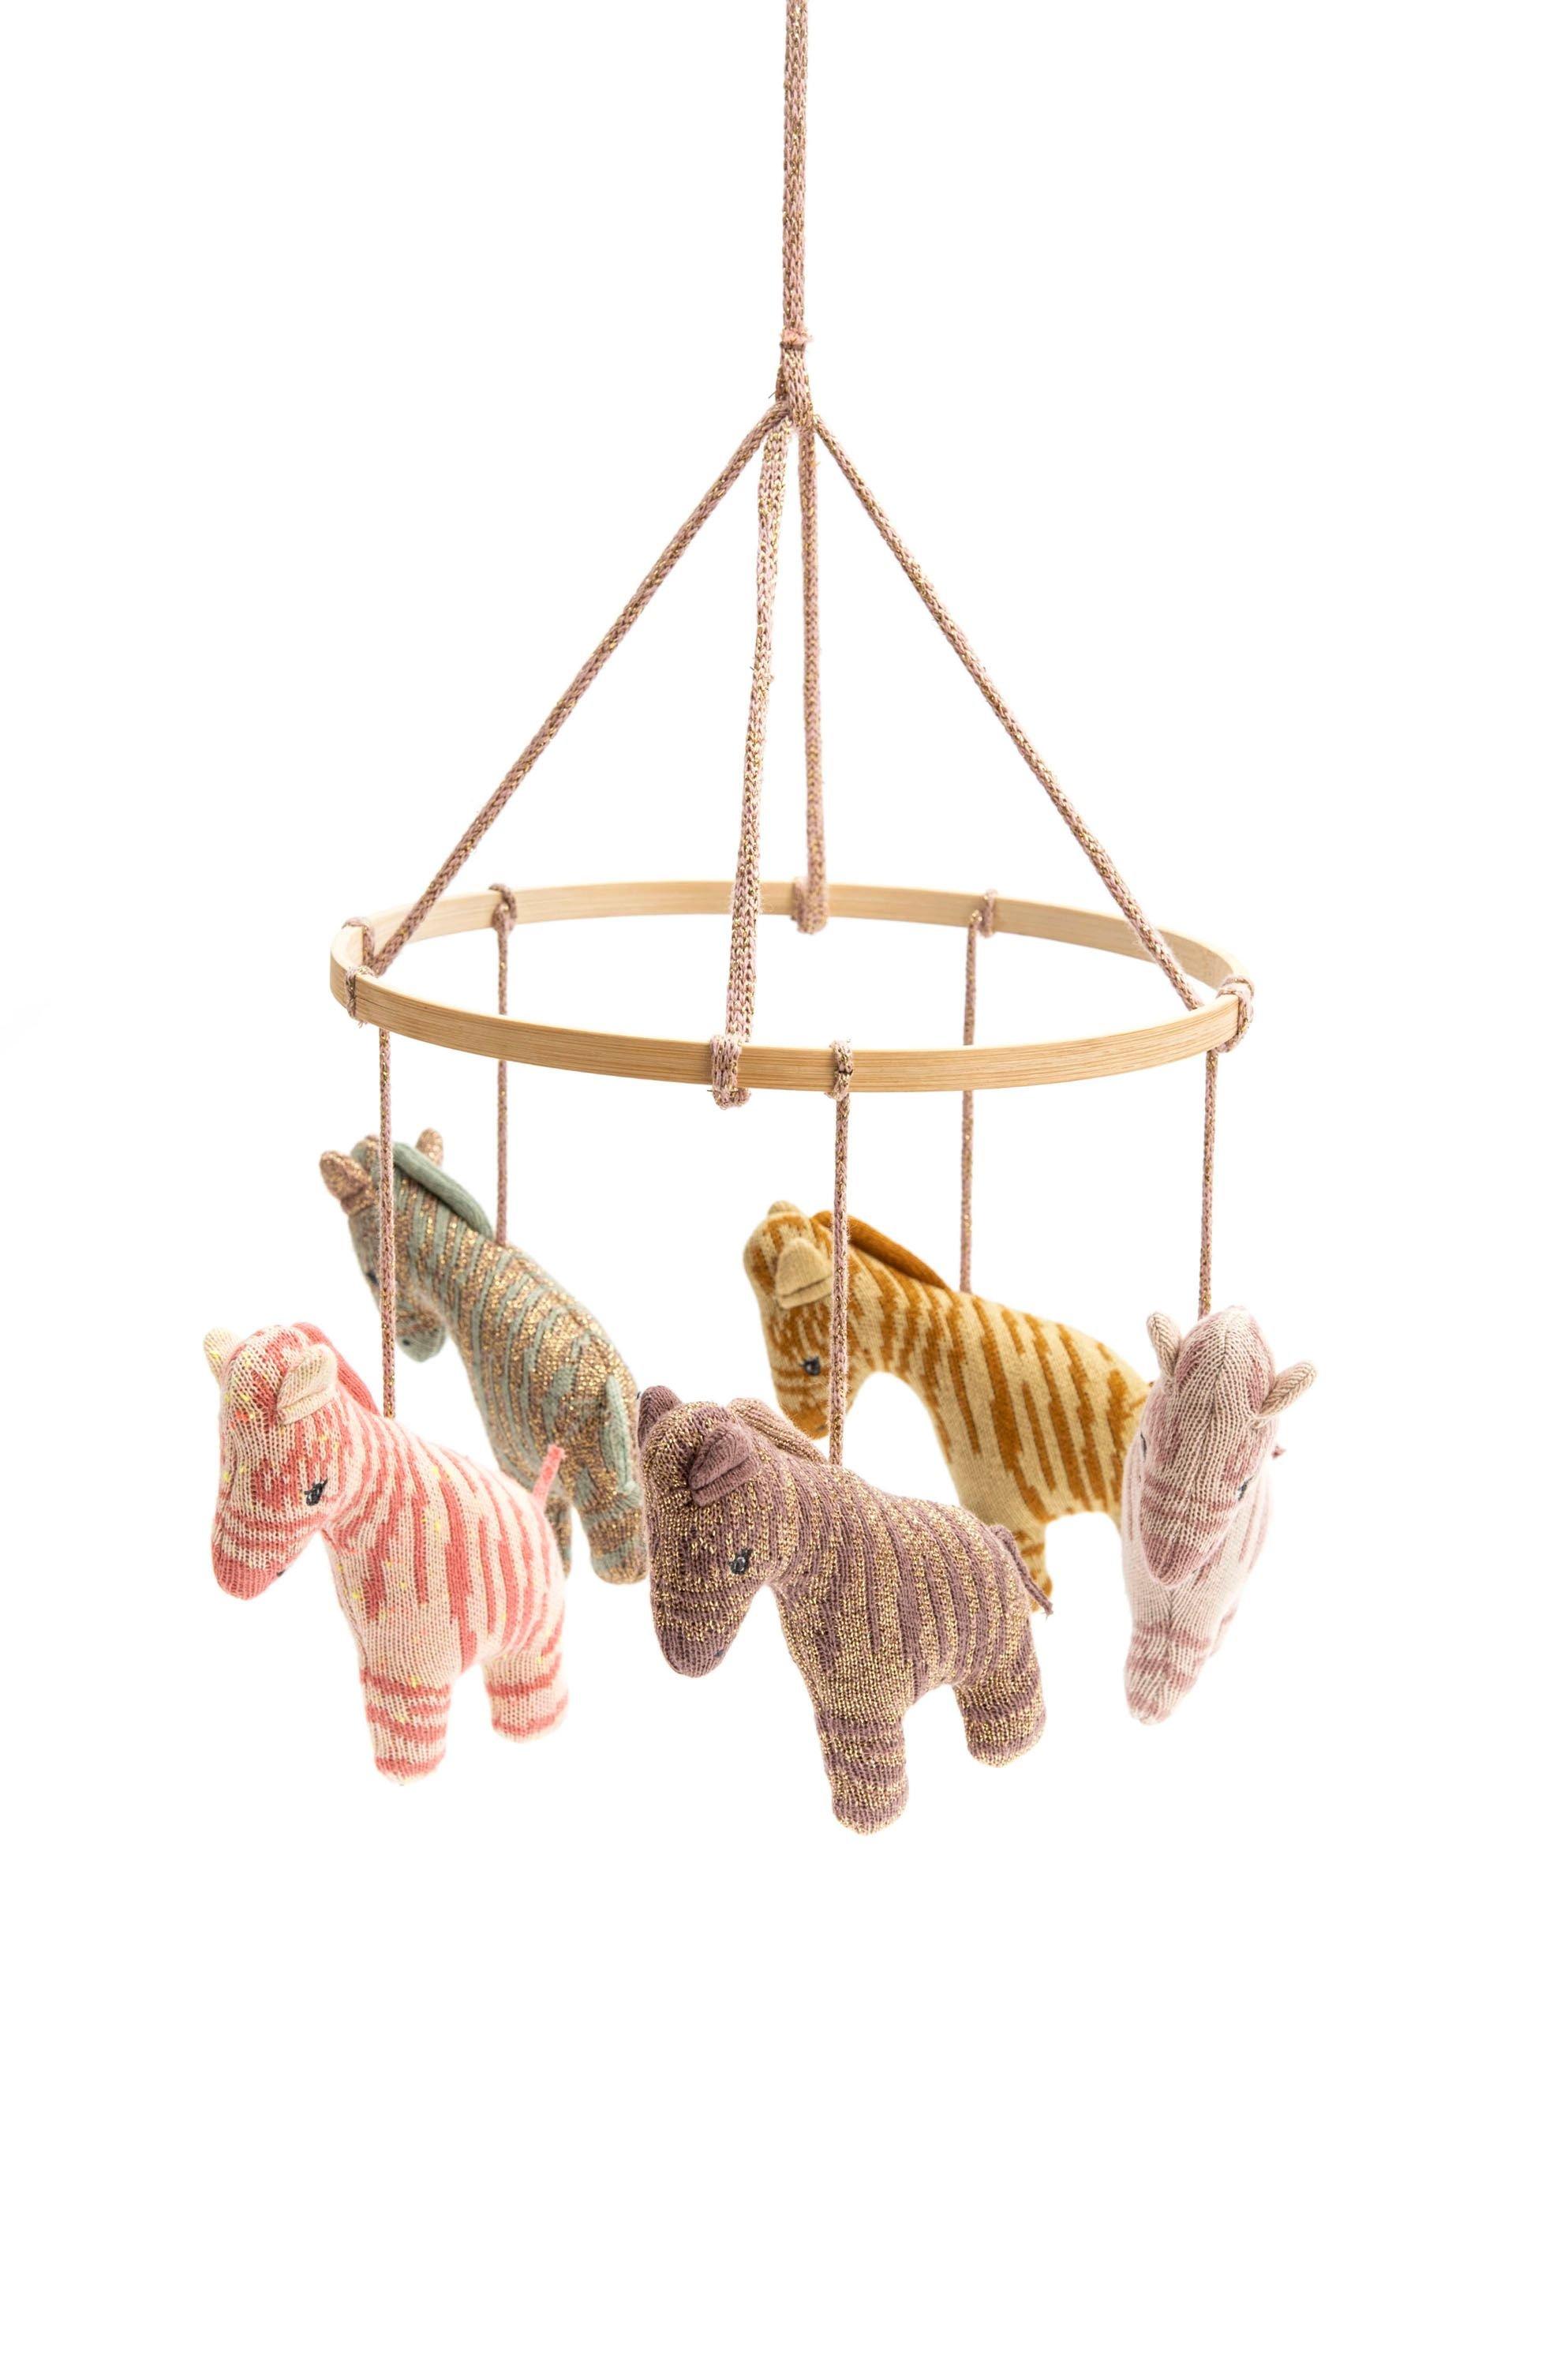 Smallstuff - Hanging Mobile - Multi Zebra